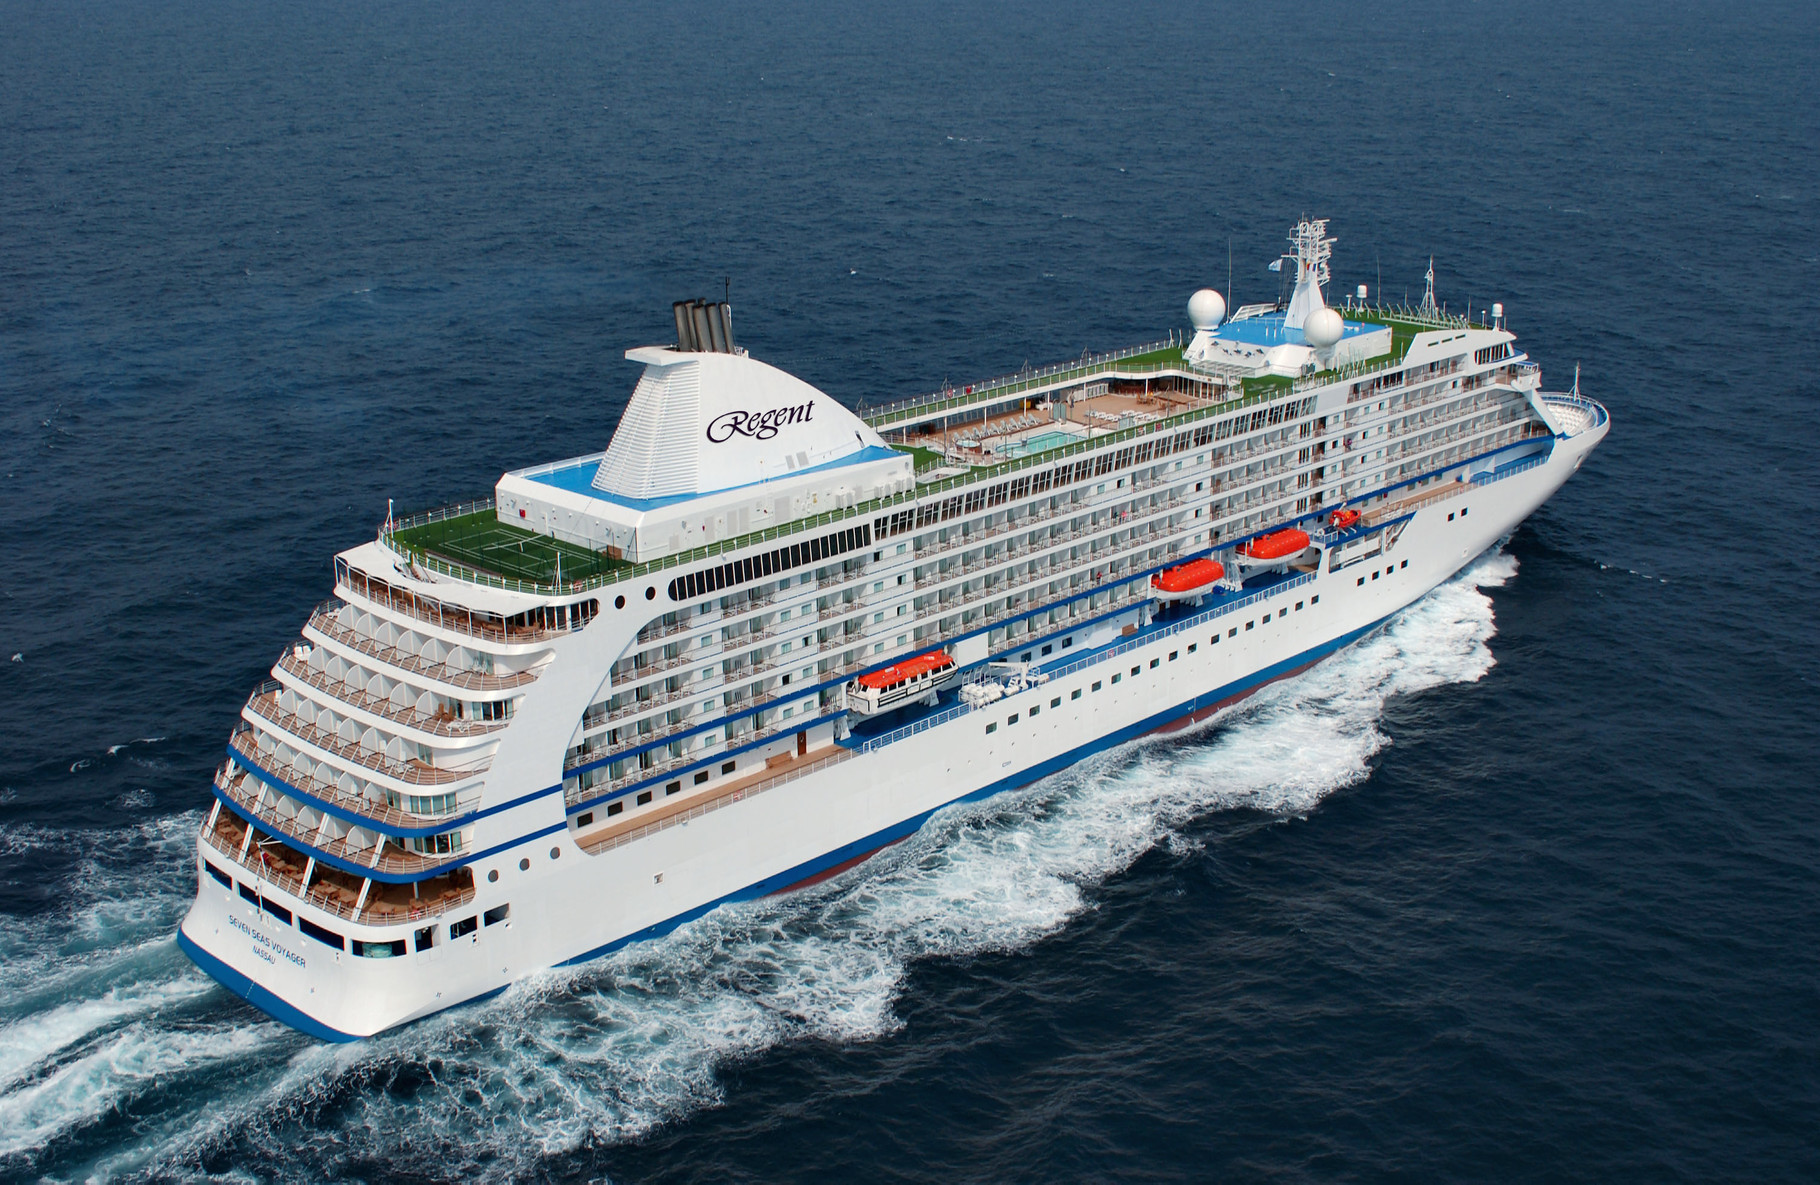 Passenger Ships And More